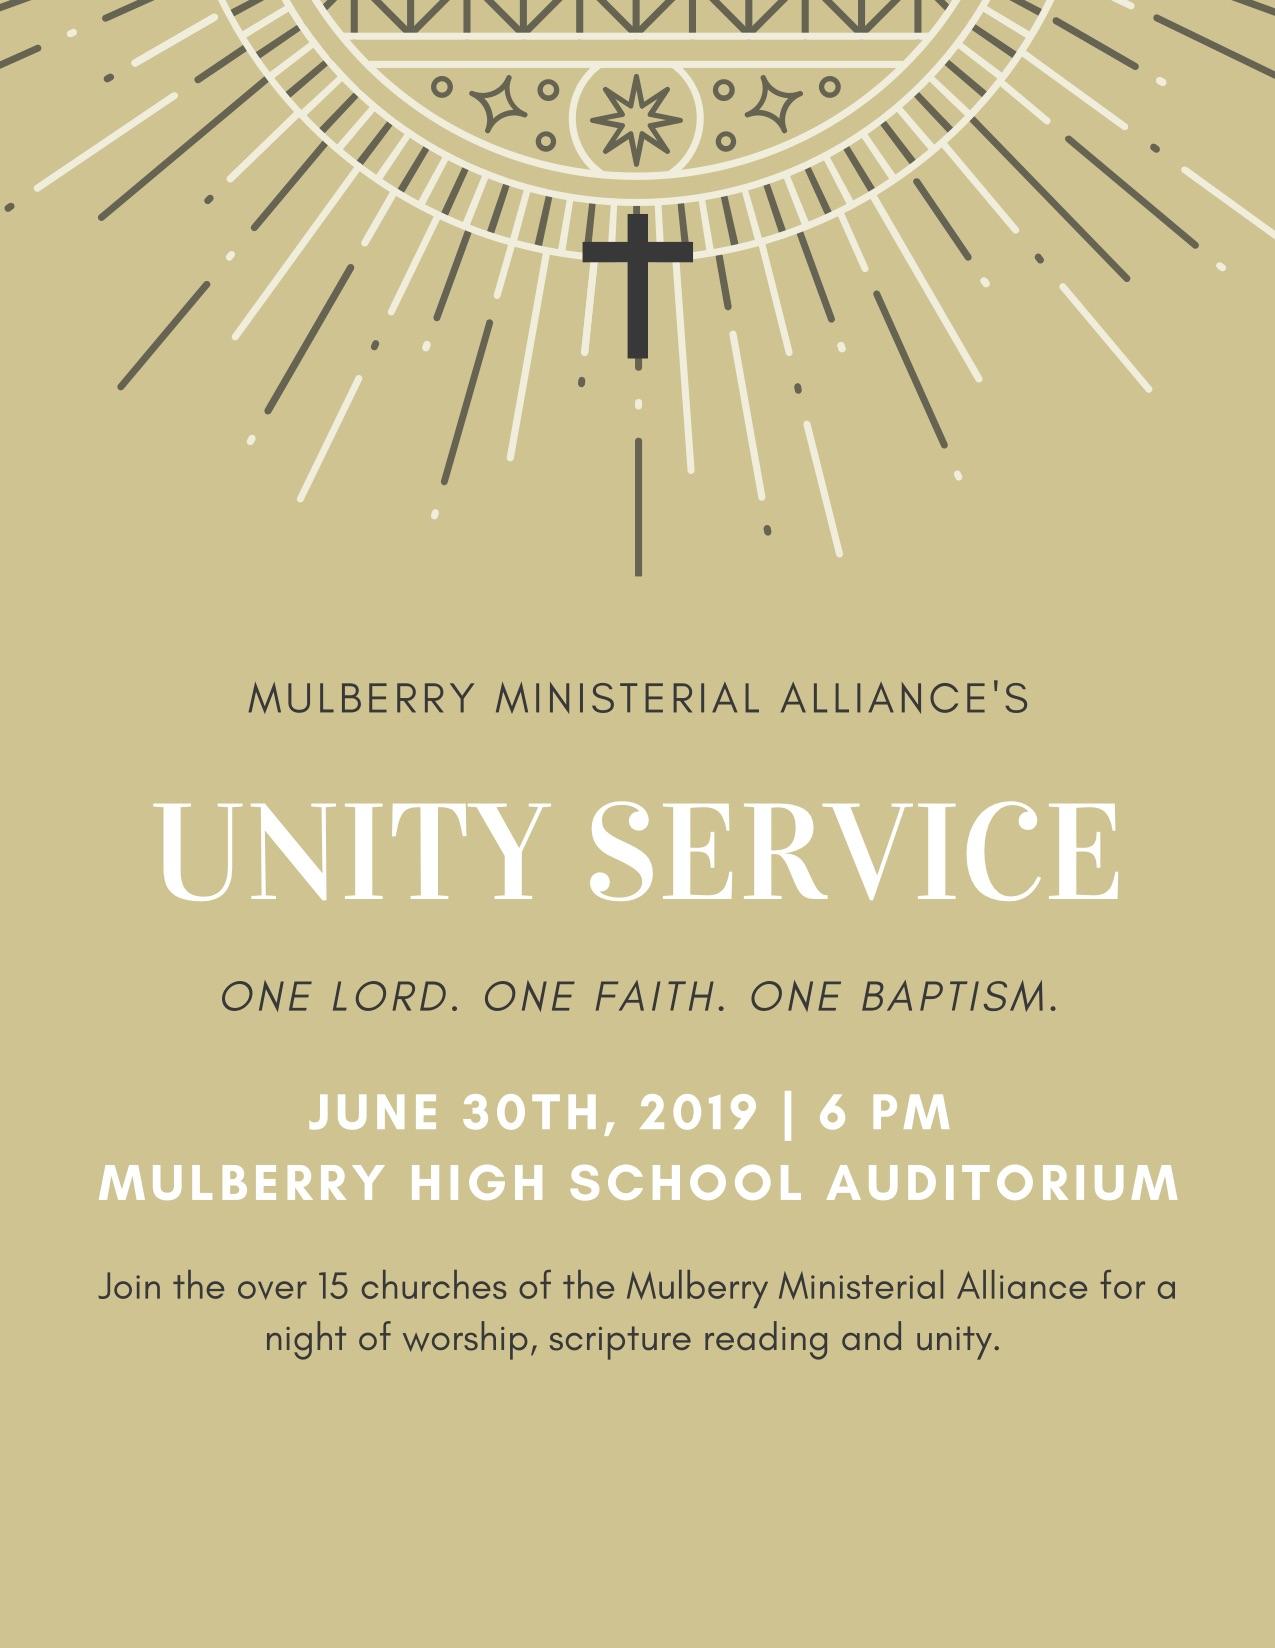 Mulberry MInisiterial Alliance.jpg